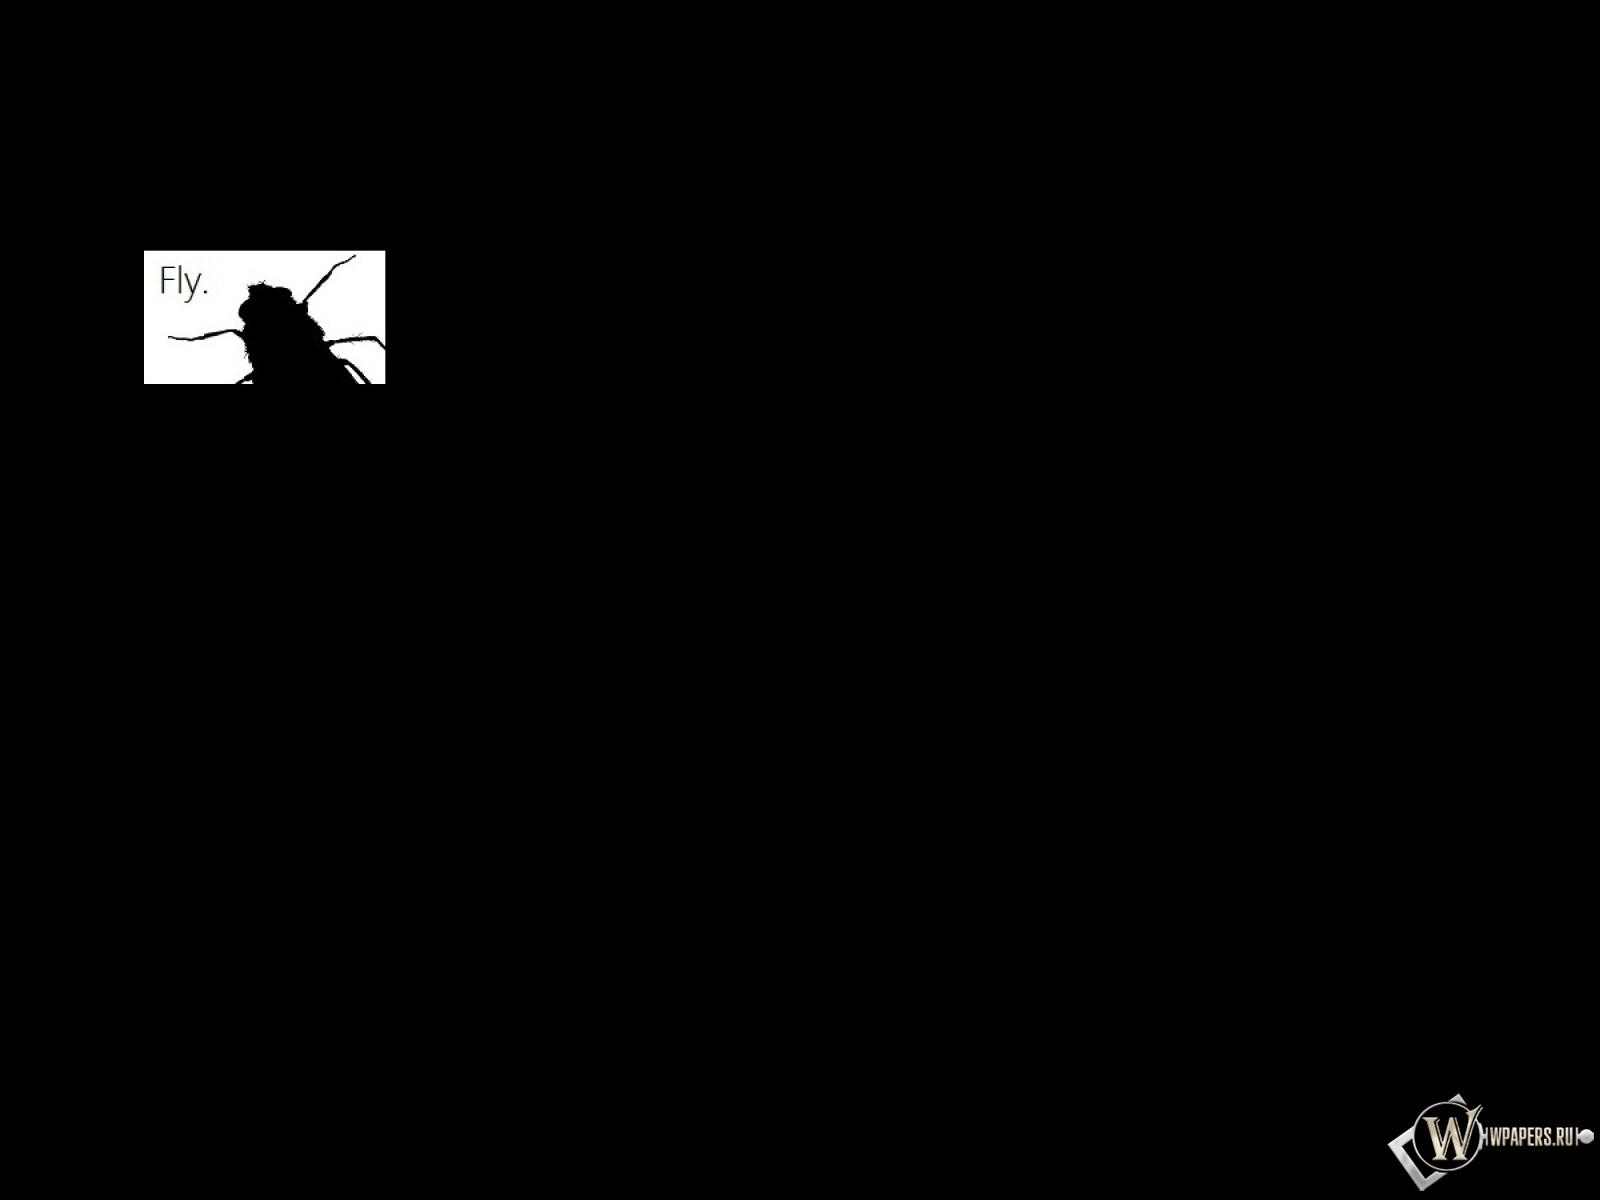 Fly (Минимализм) 1600x1200